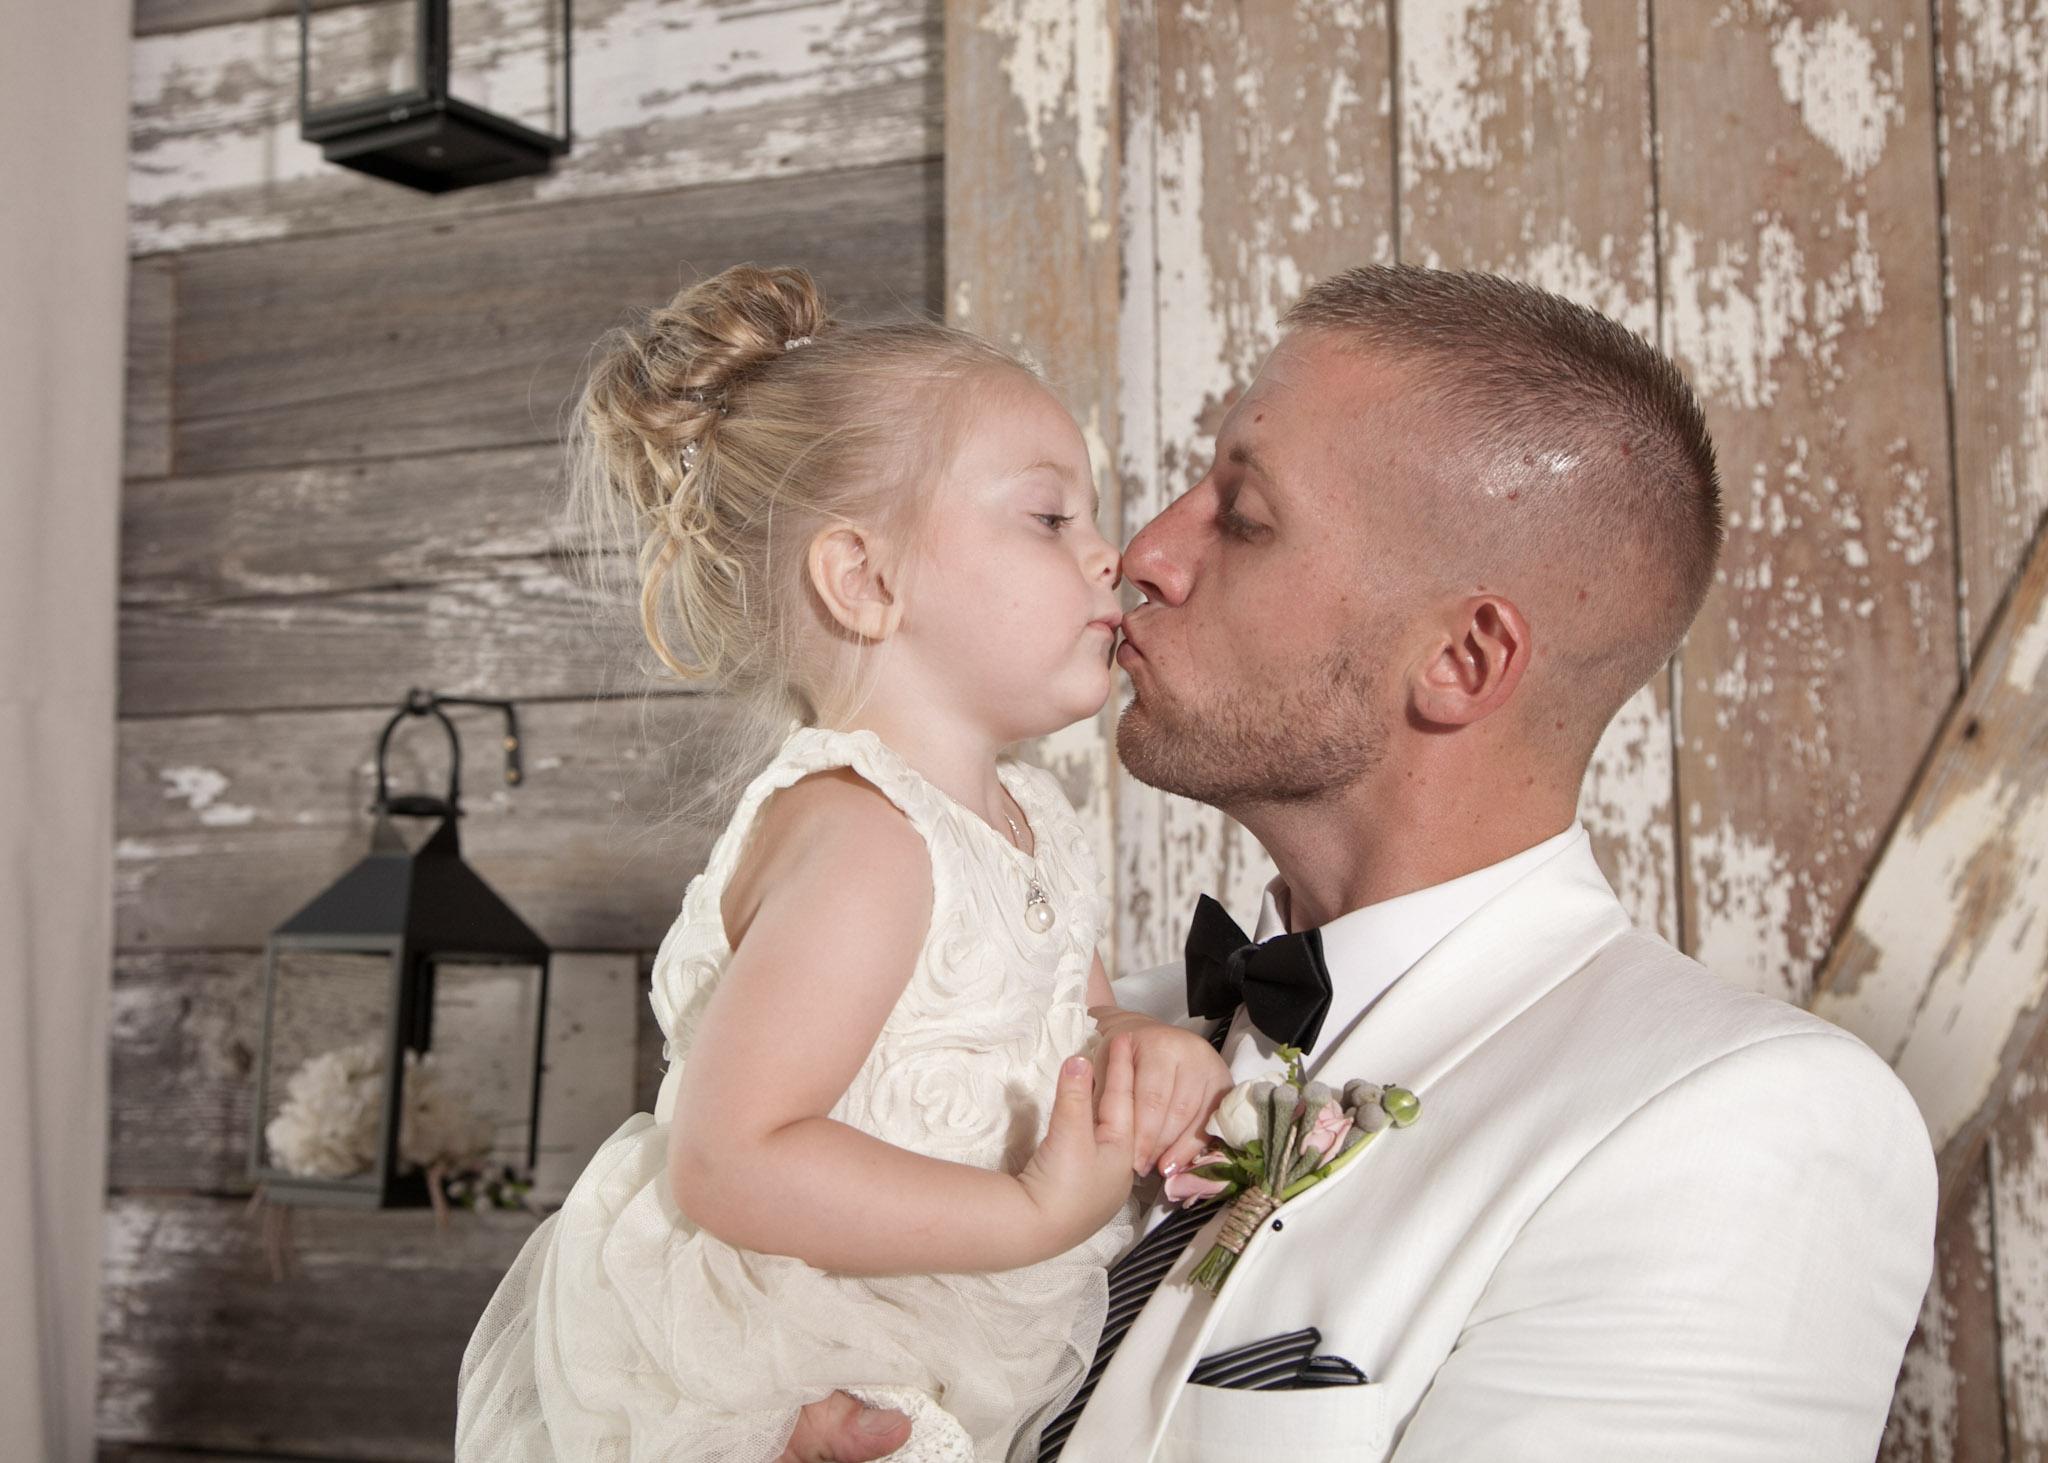 Kansas_City_Small_Wedding_Venue_Elope_Intimate_Ceremony_Budget_Affordable_394J&S.JPG